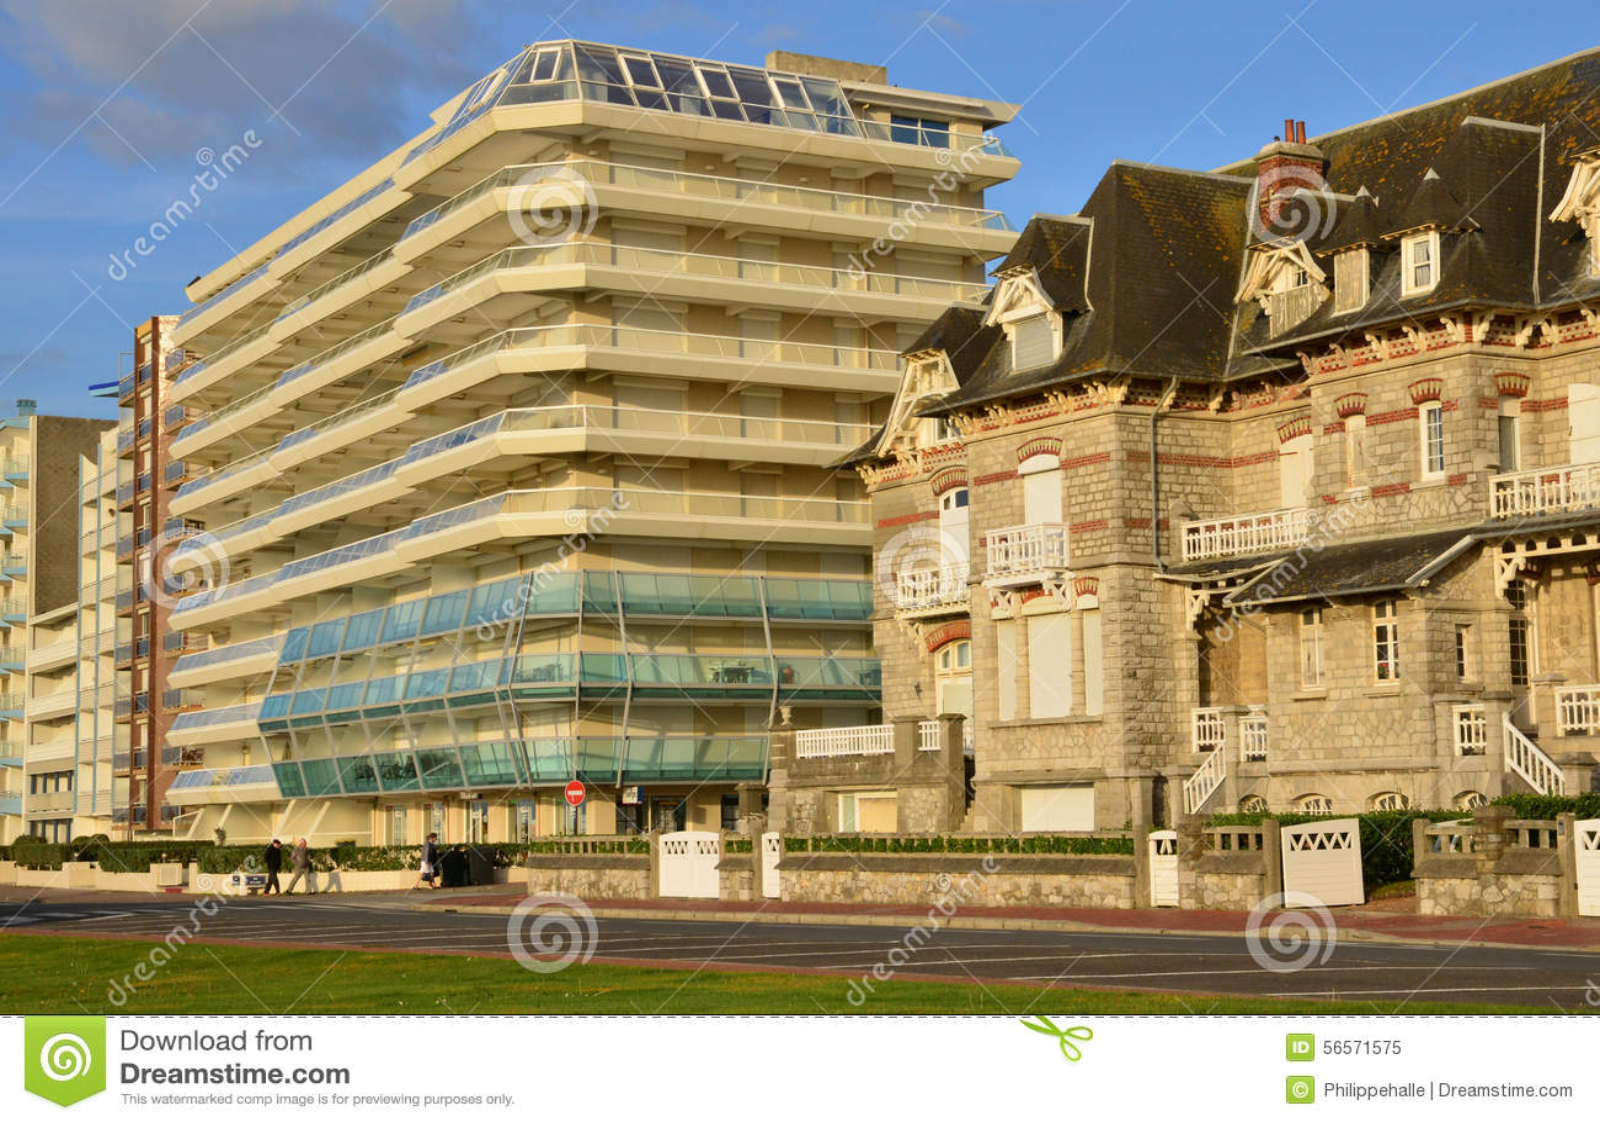 Download Γαλλία, γραφική πόλη LE Touquet στο Nord-Pas-de-Calais Εκδοτική εικόνα - εικόνα από touristy, ιστορικός: 56571575